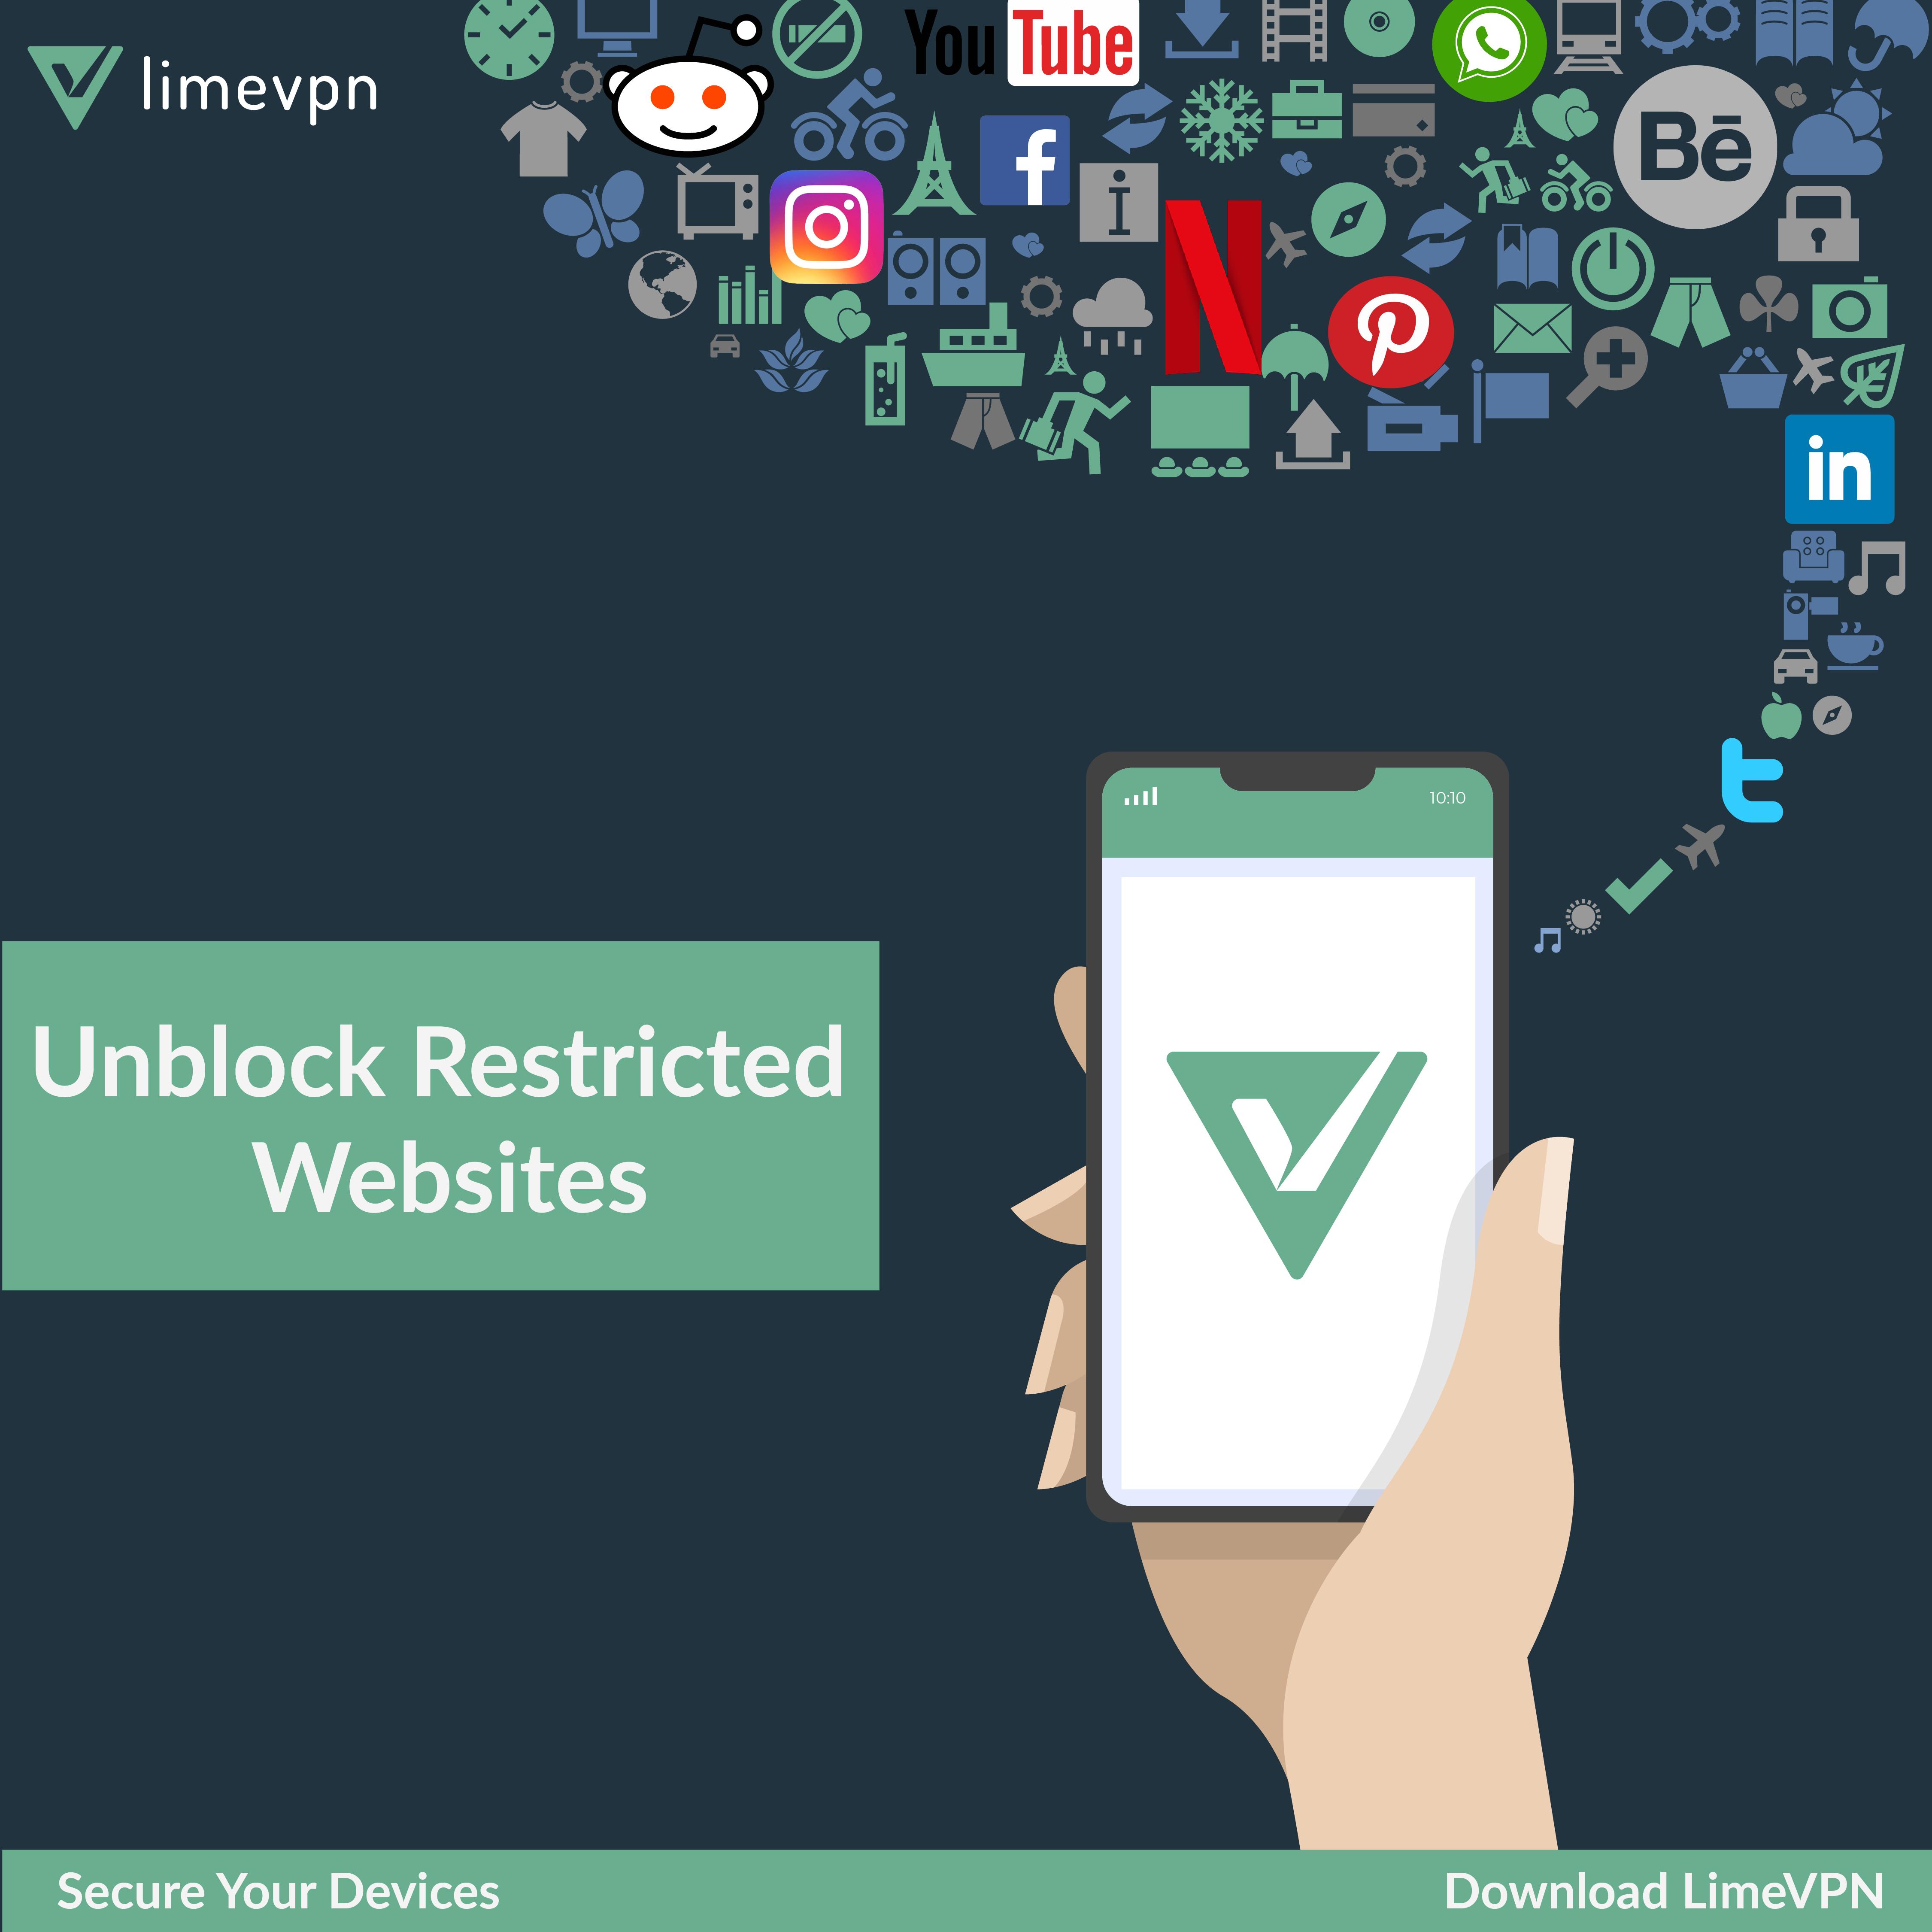 Unblock Restricted Websites! Website, Youtube, Creative